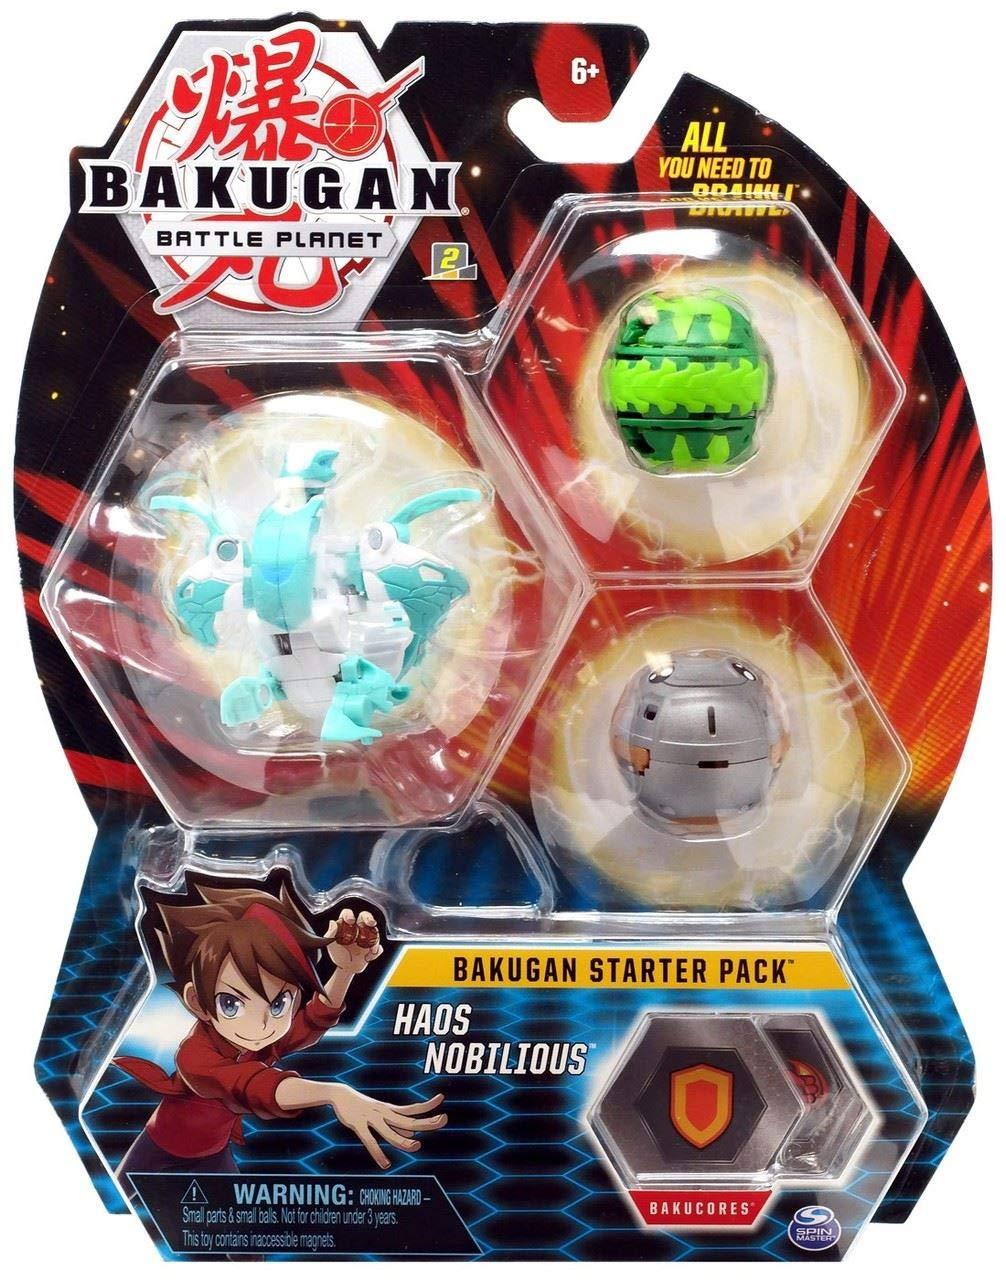 Bakugan starter pack Haos Nobilious